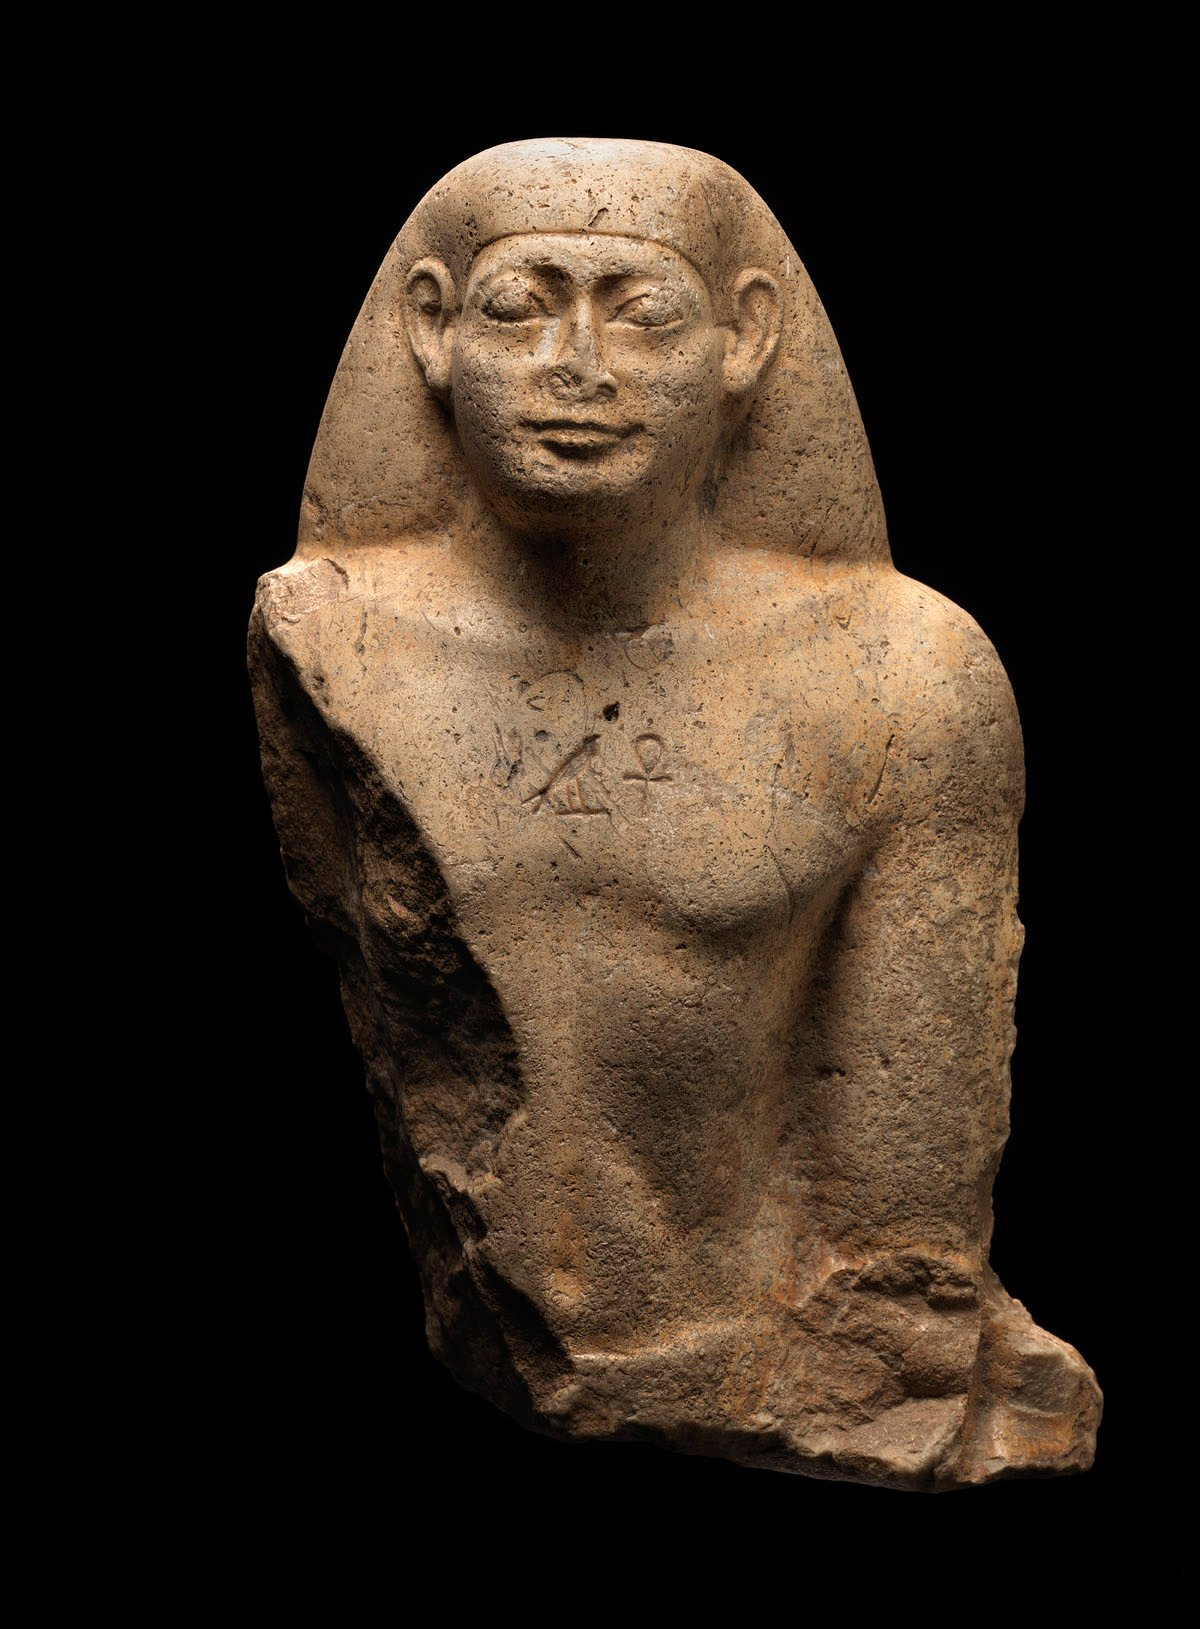 Sycomore Ancient Art